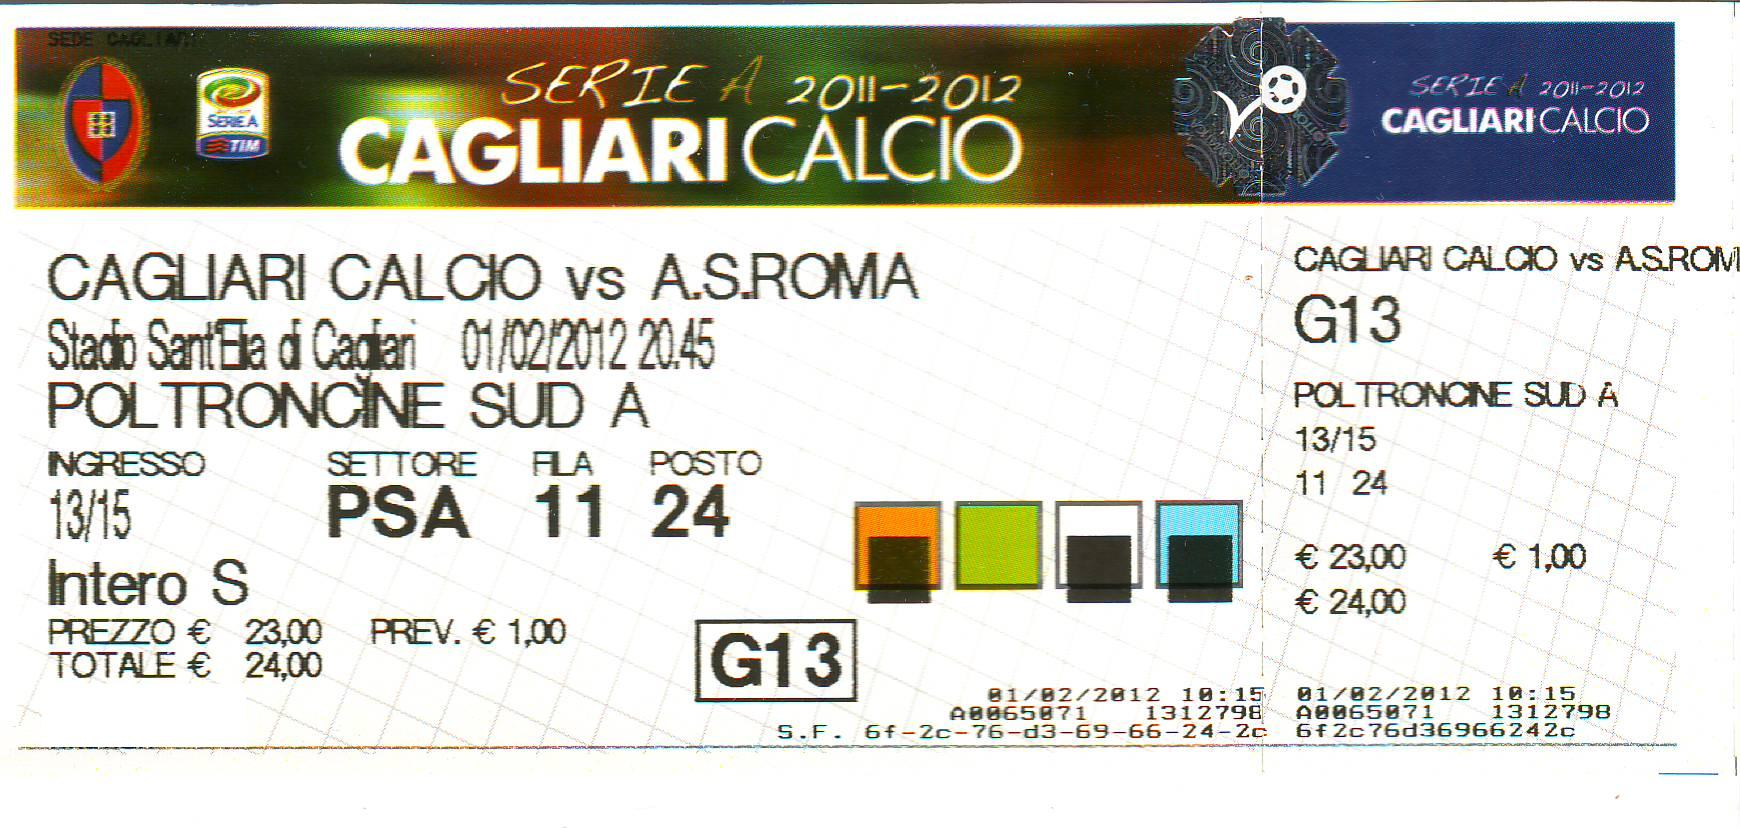 biglietti 2011 12